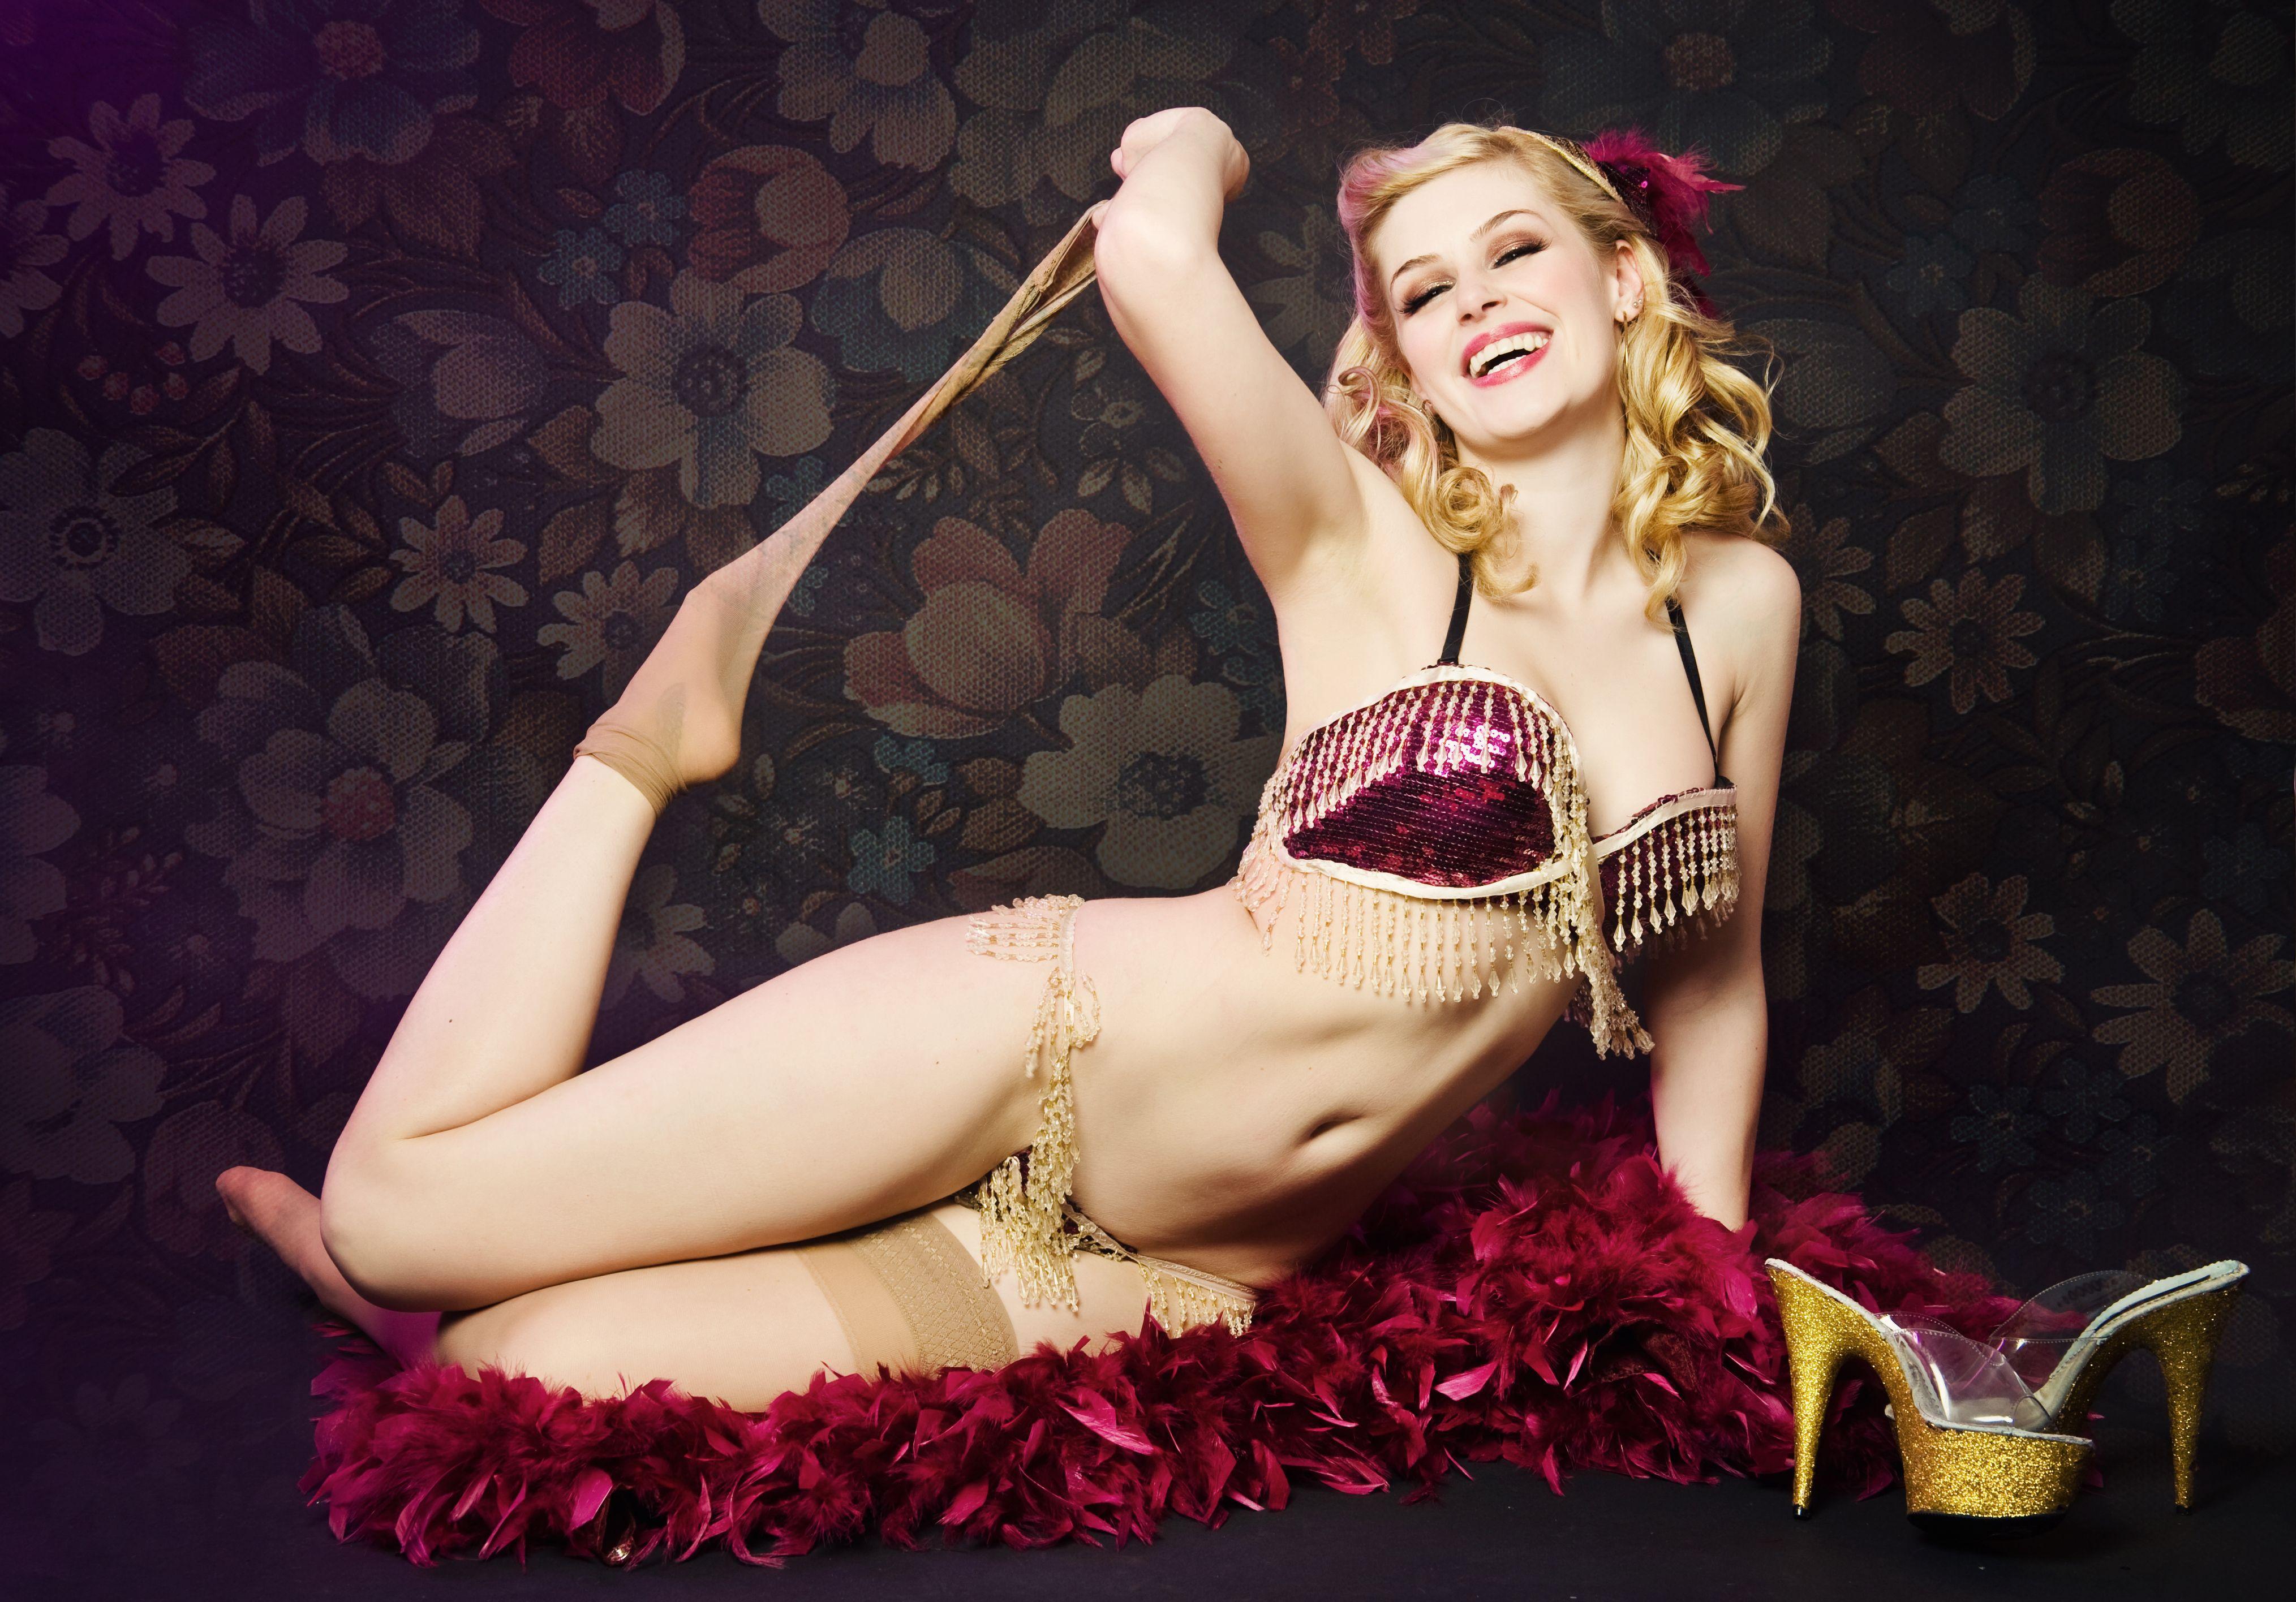 Sexy Cabaret Nightclub Glamorous Hostess Opening Champagne Bot Stock Photo